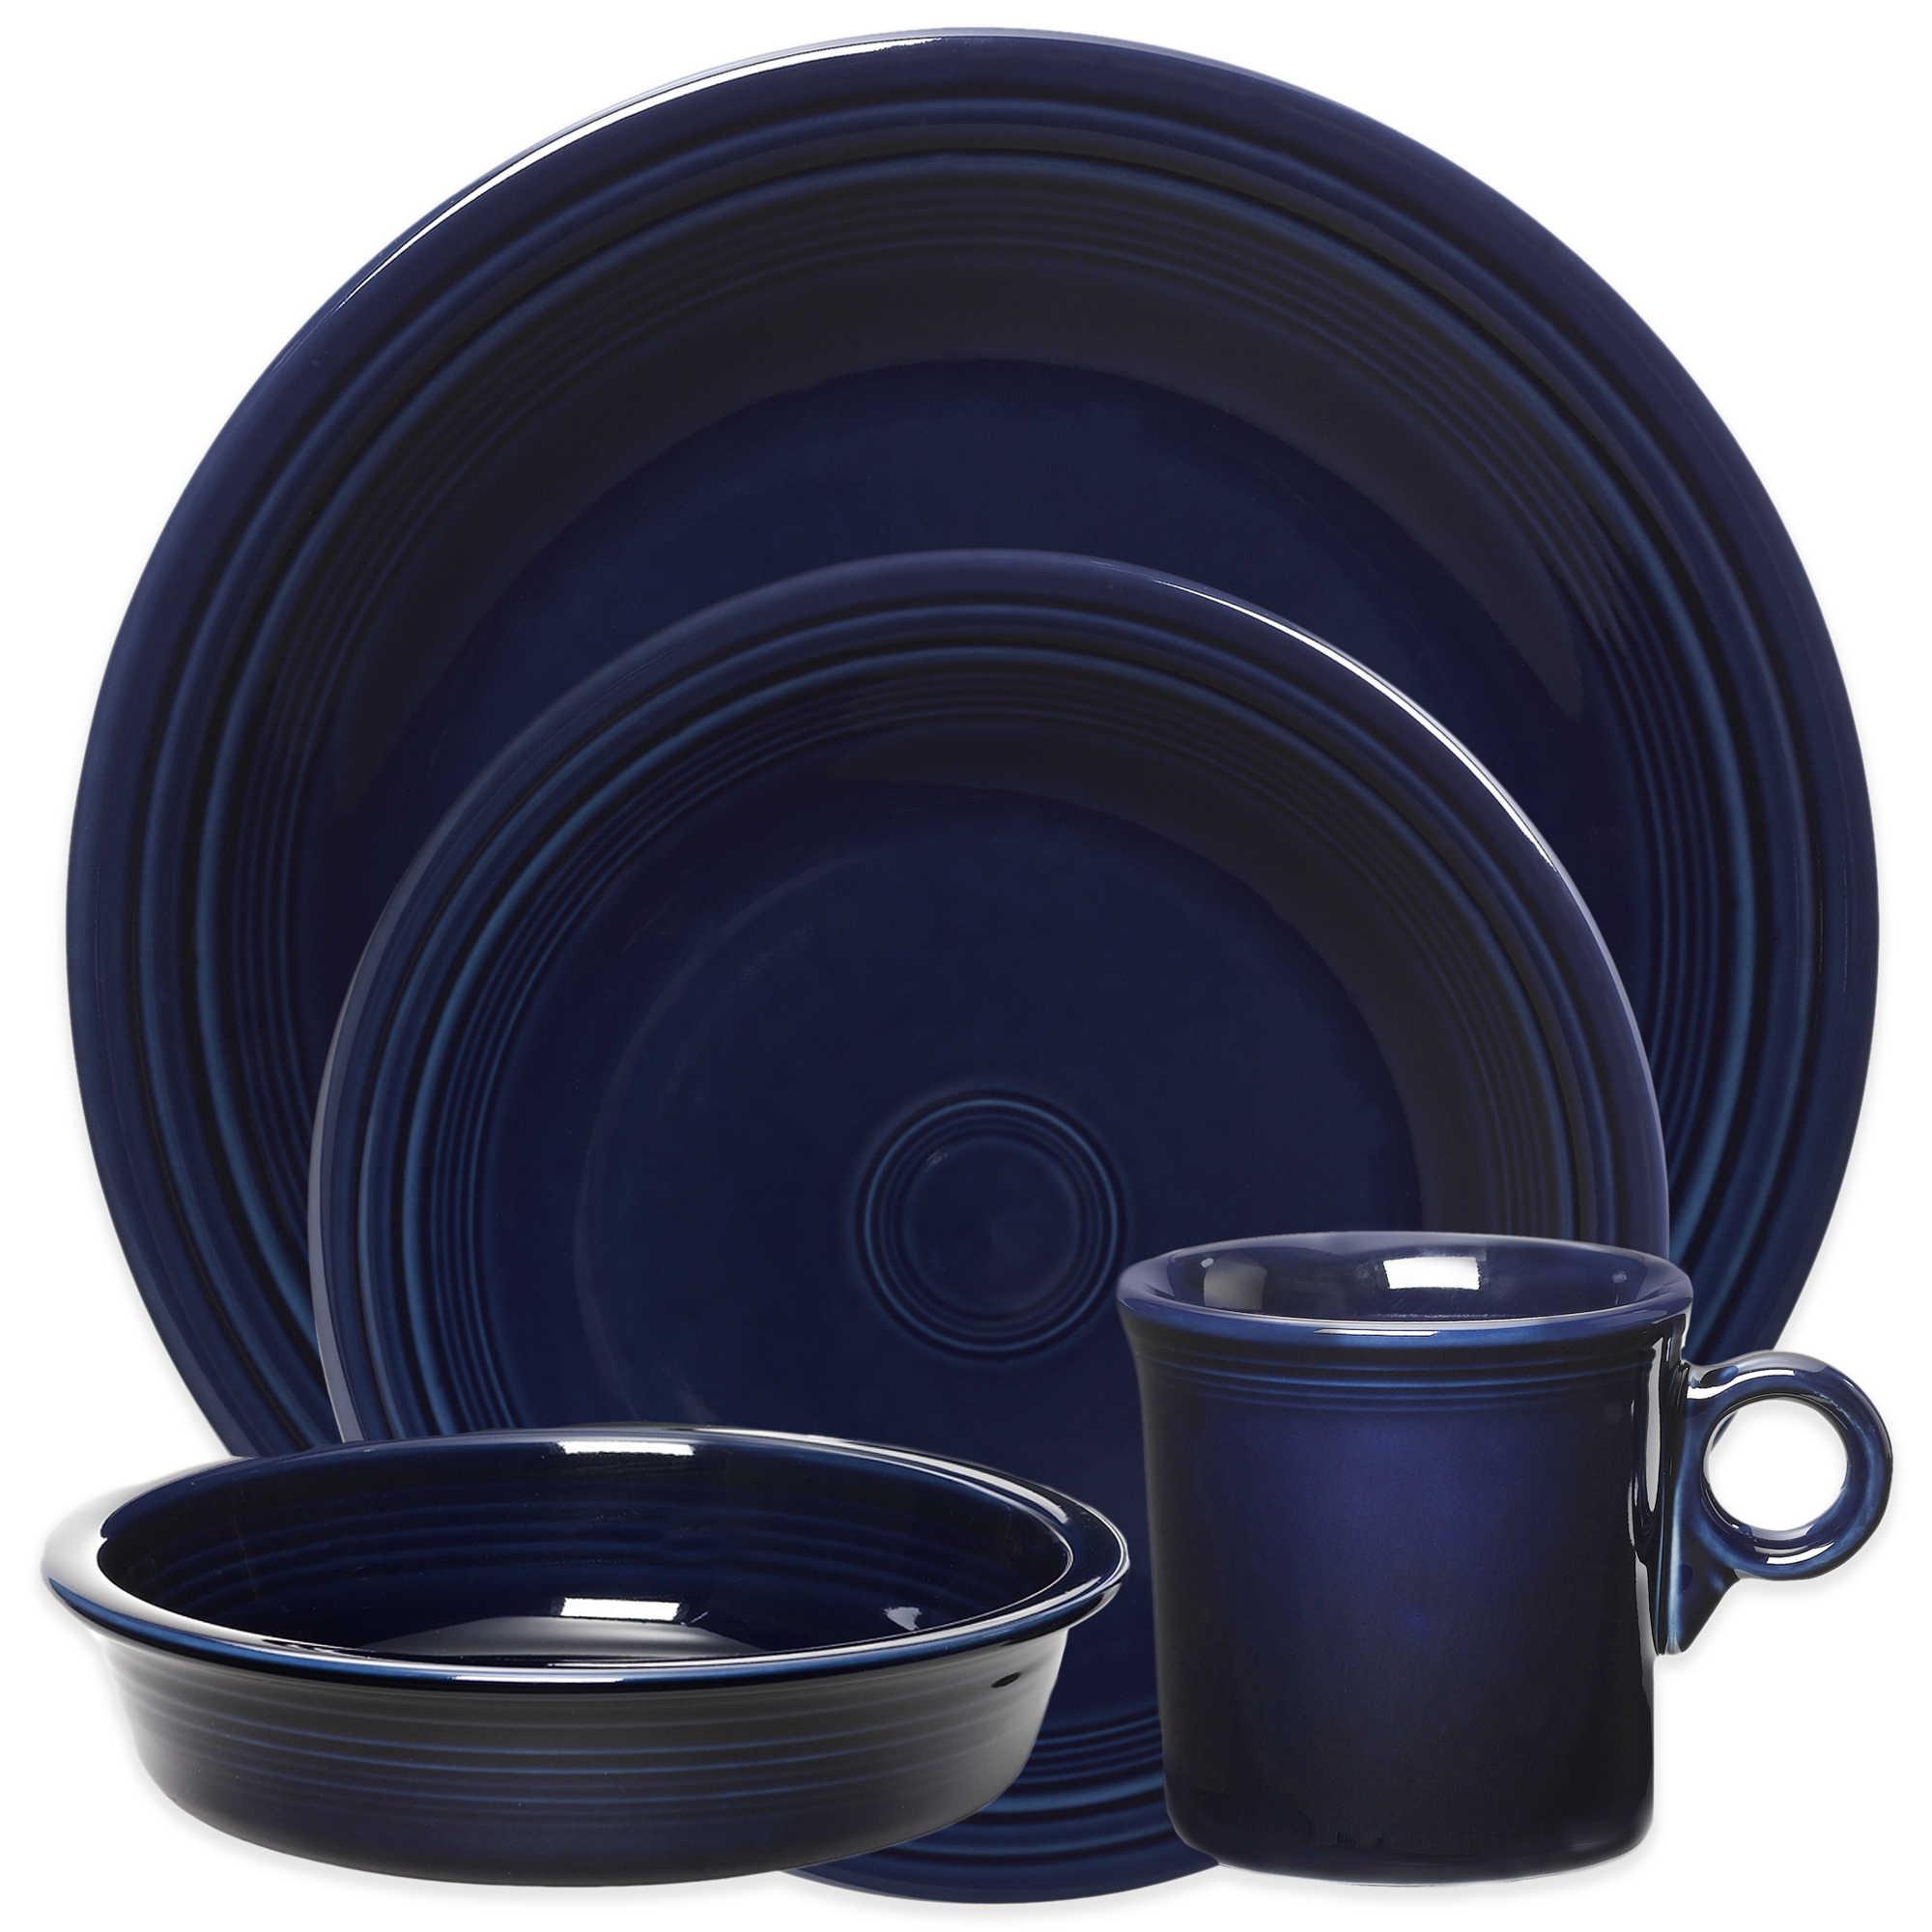 Cobalt Blue Toilet Serveware in Cobalt Blue